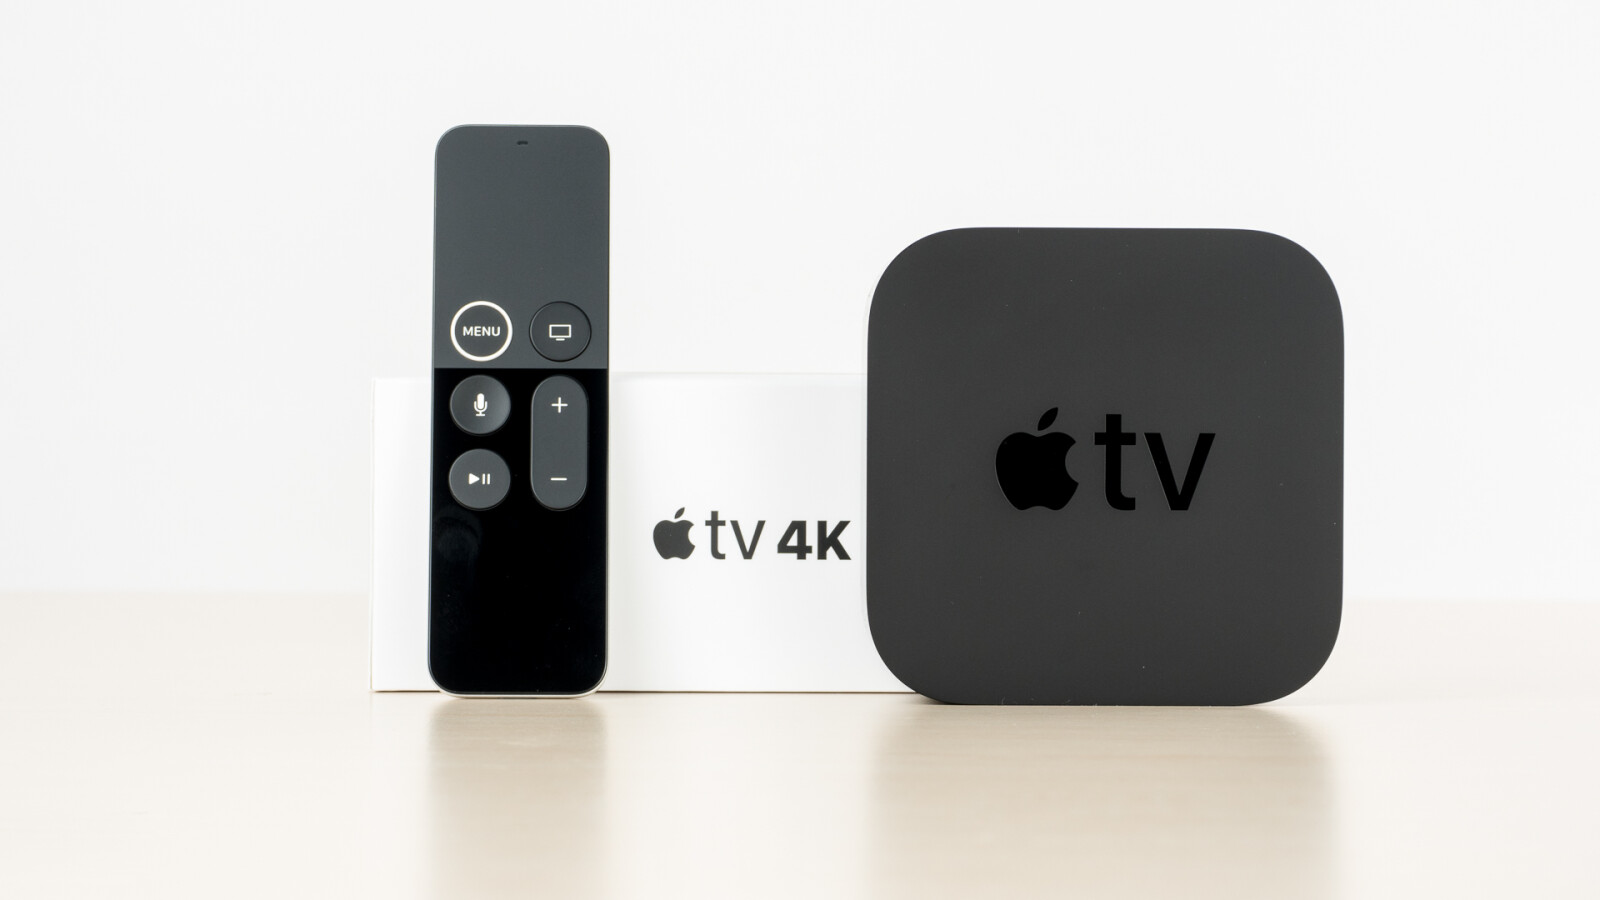 Ibvpn apple tv 4